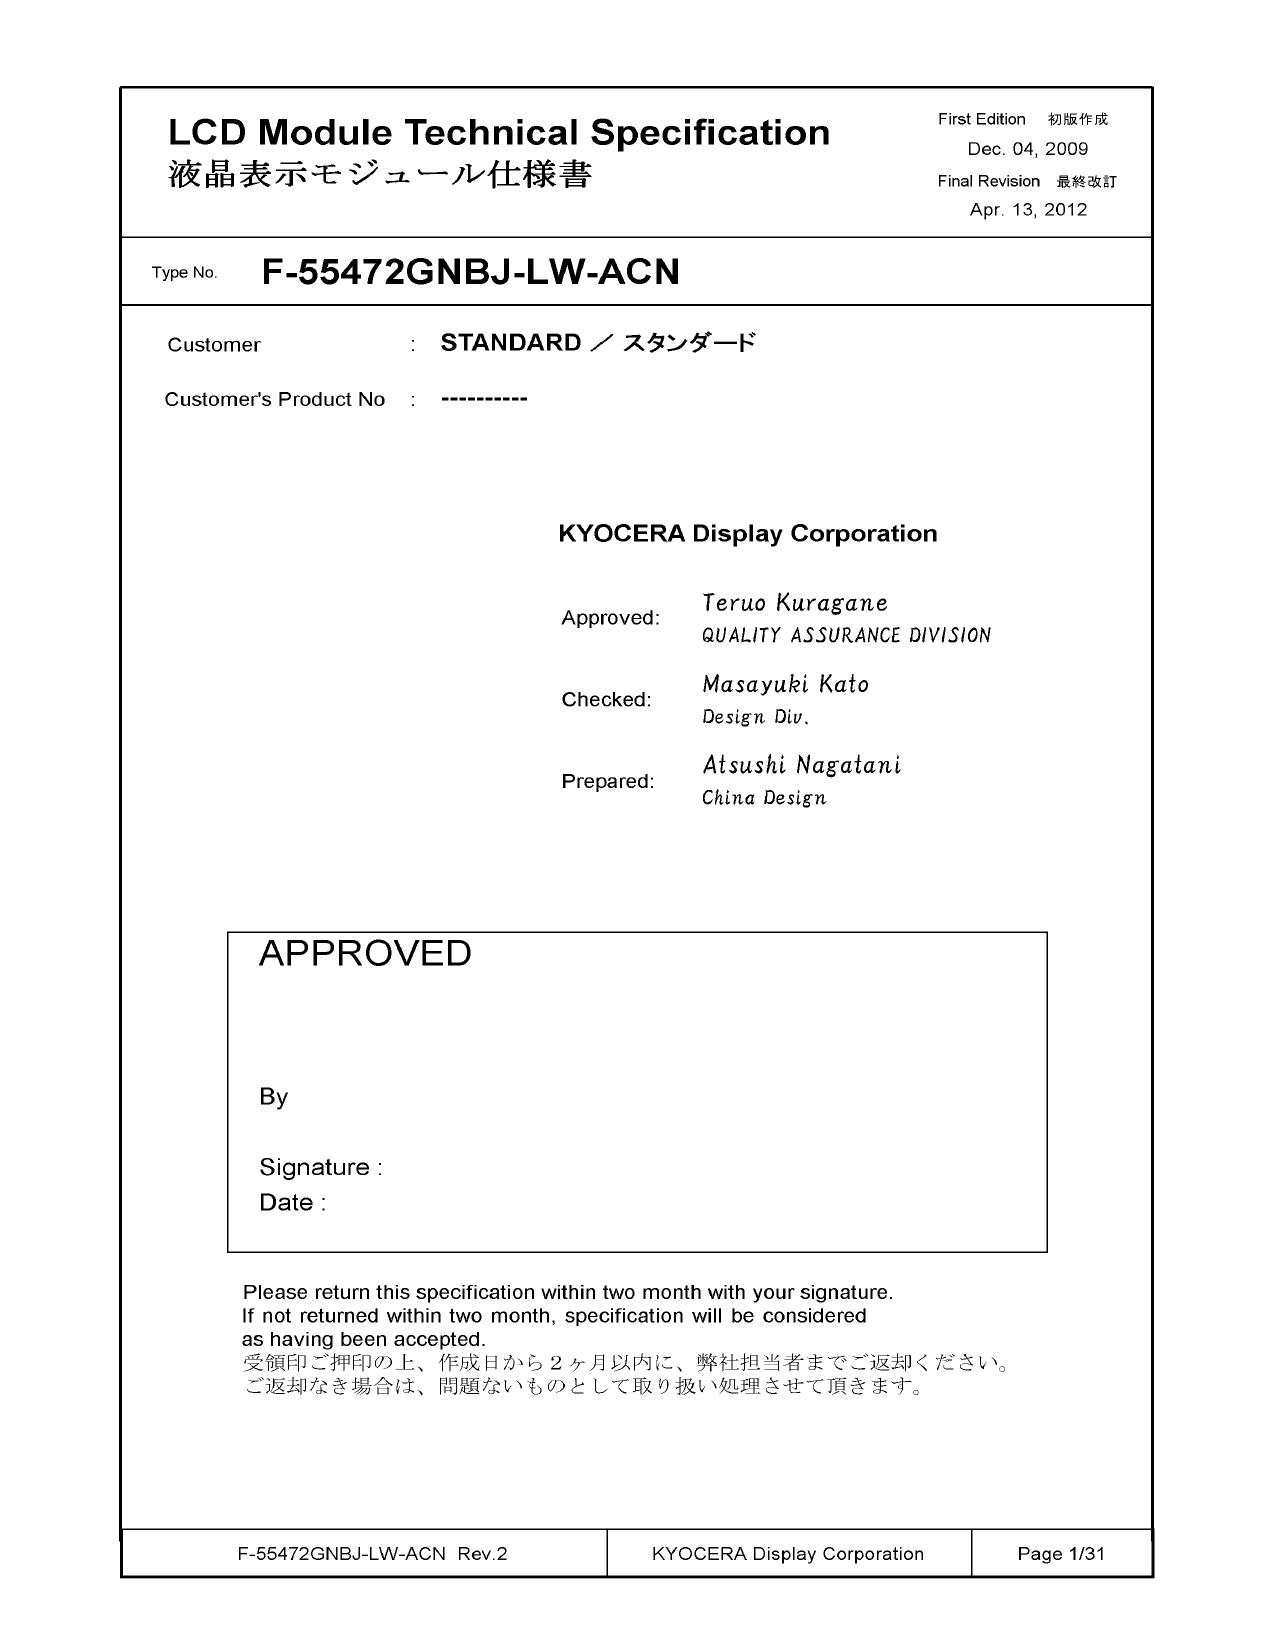 F-55472GNBJ-LW-ACN datasheet